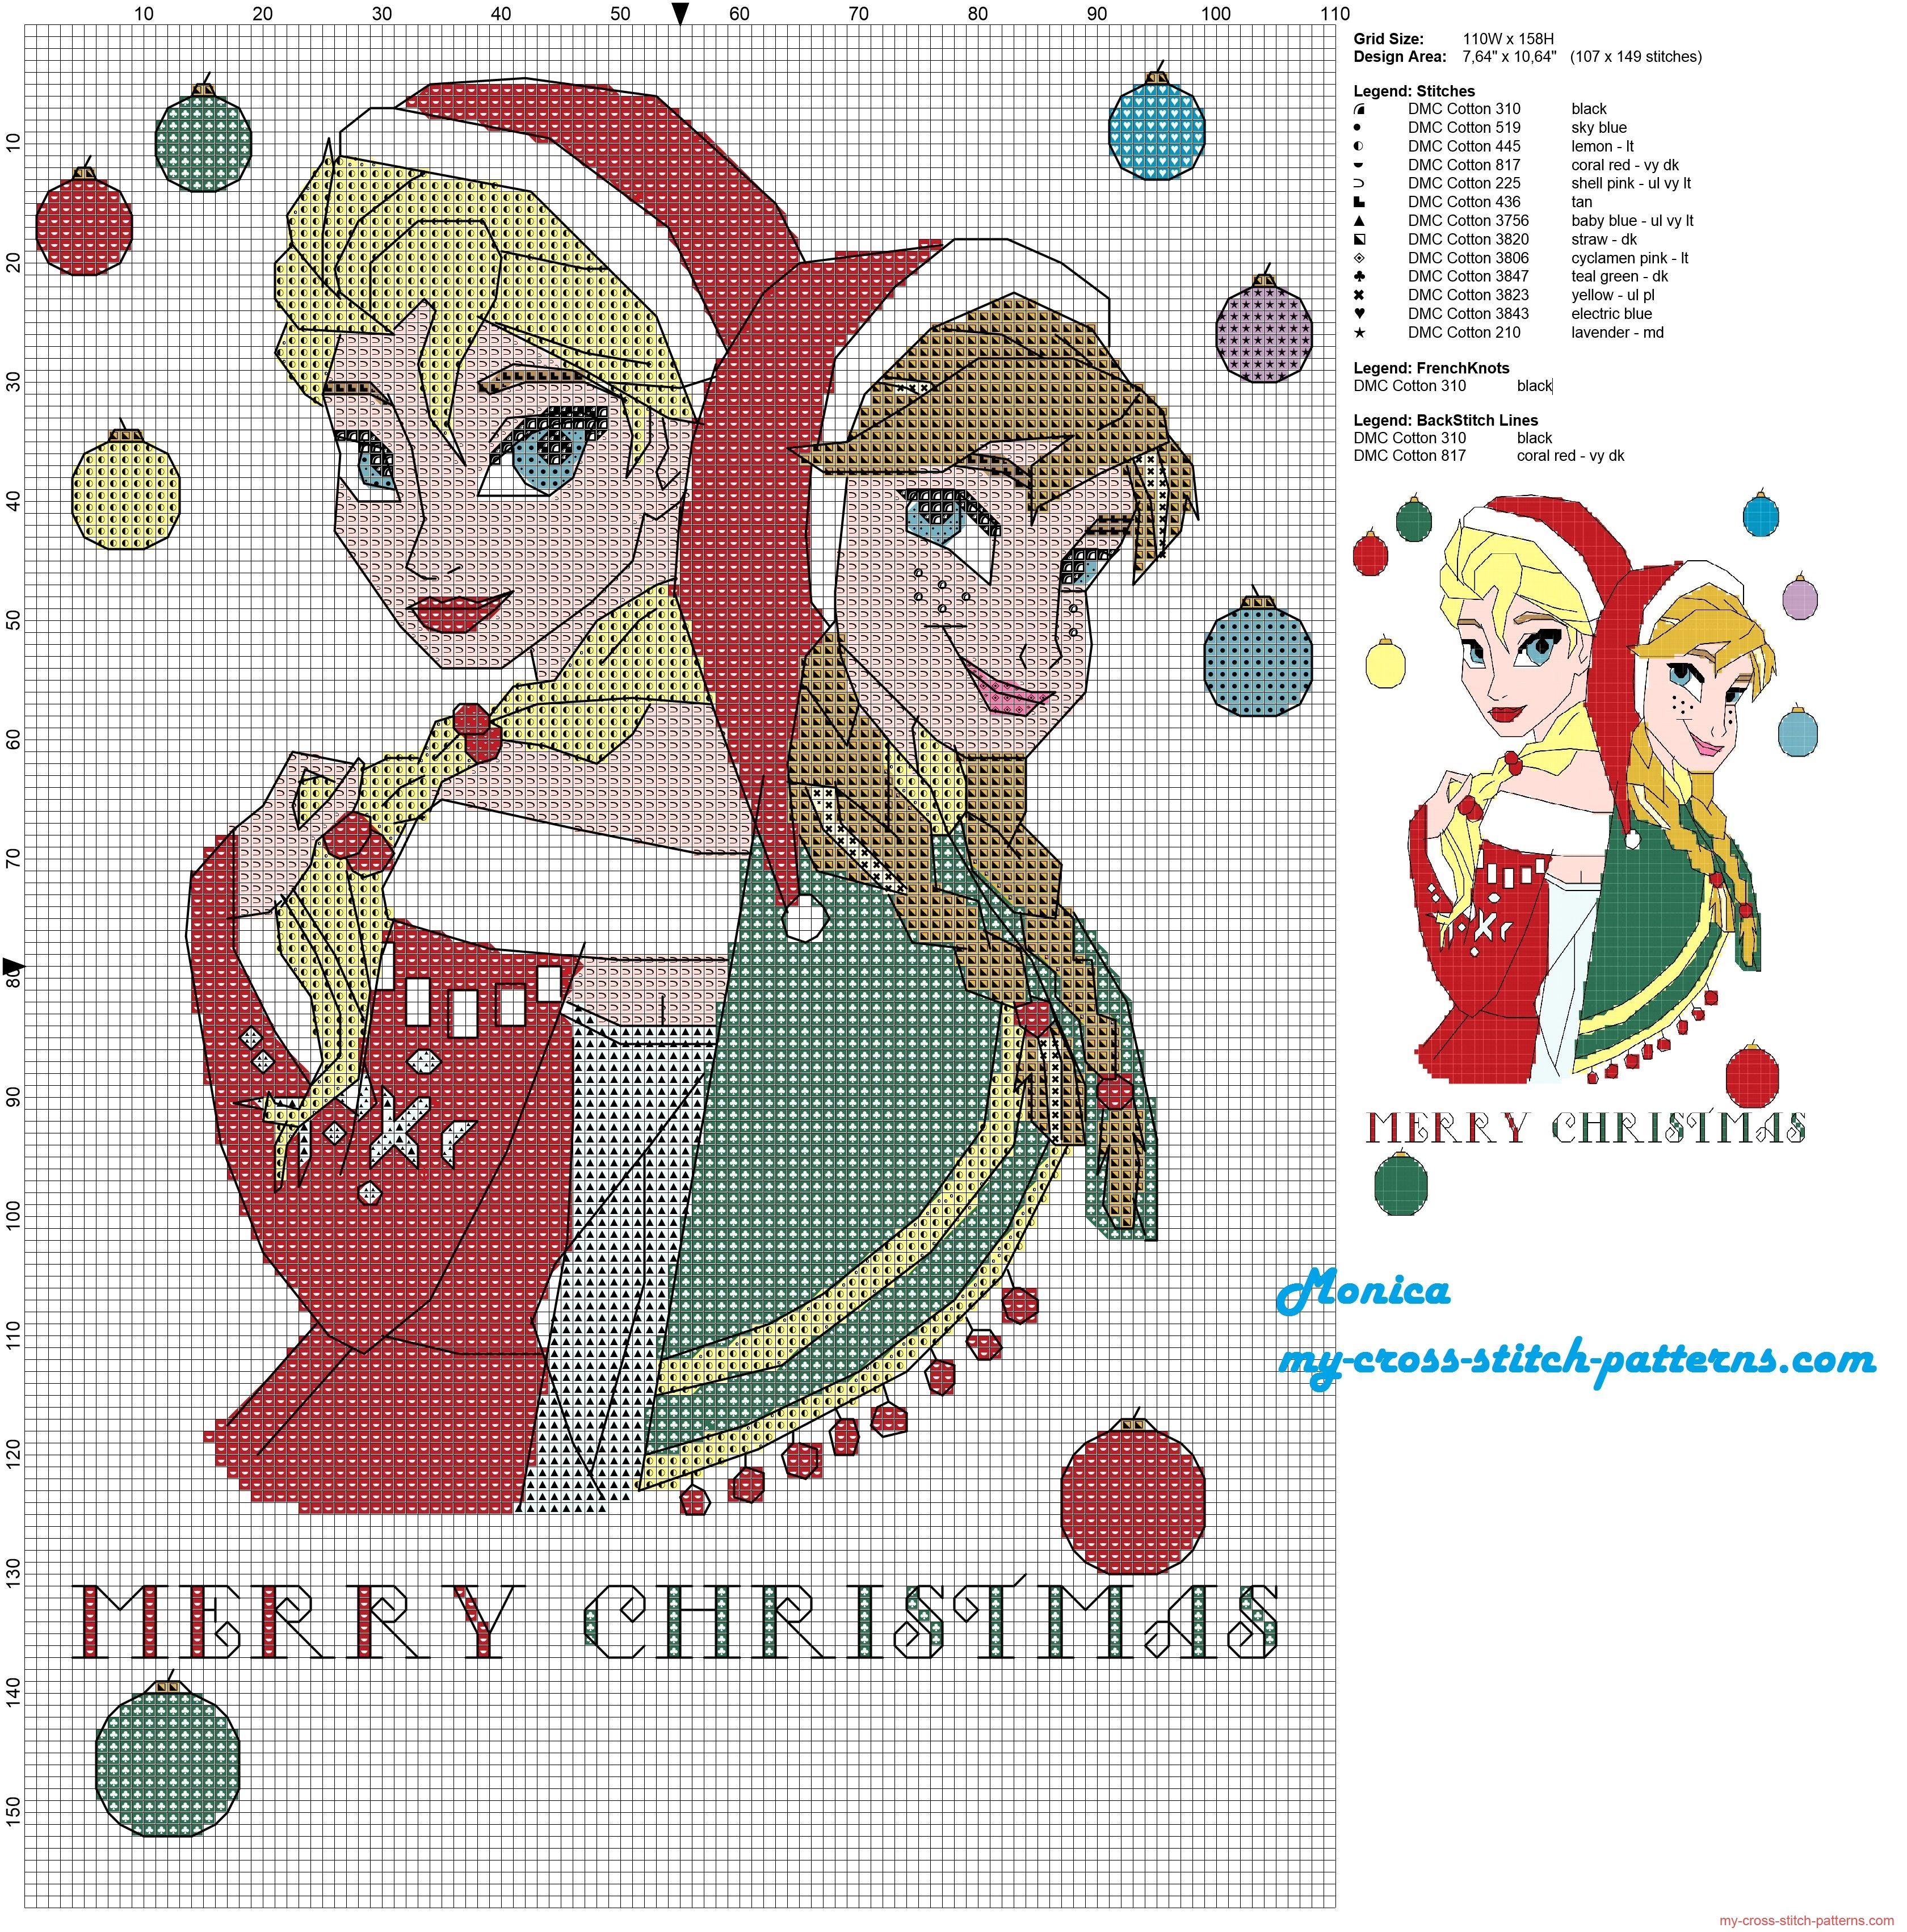 Elsa and Anna Merry Christmas cross stitch pattern | crafts